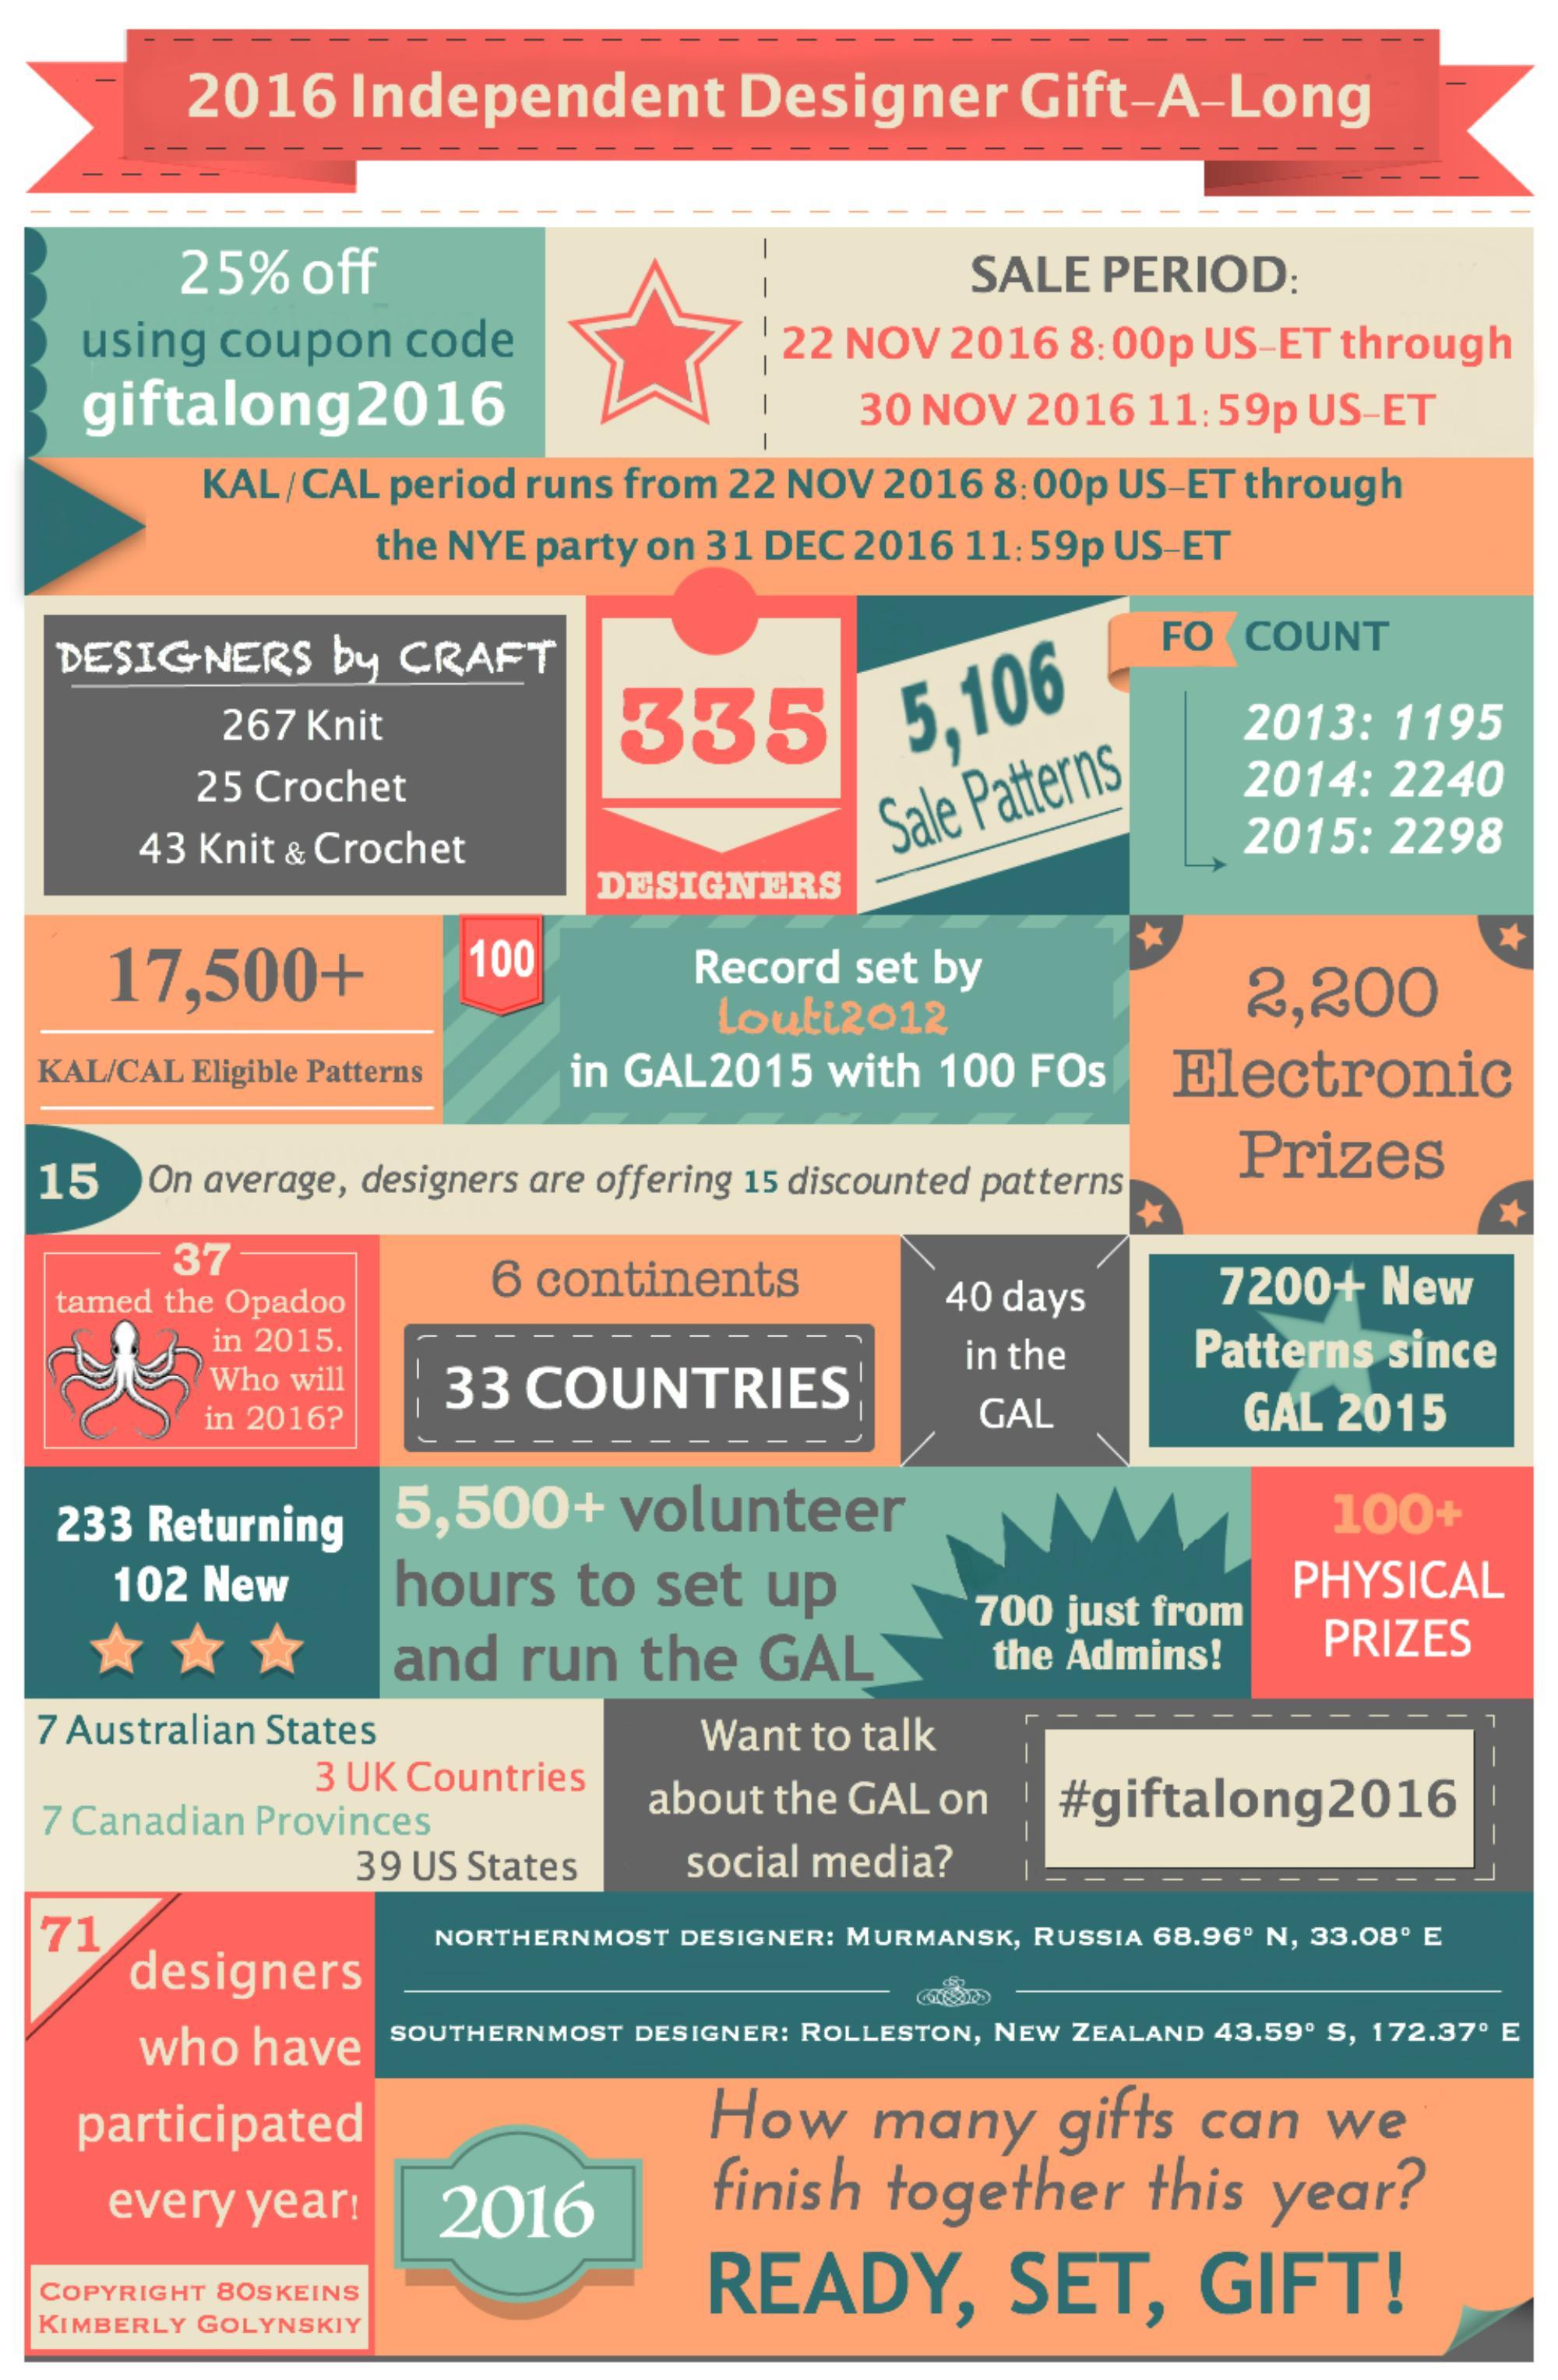 Giftalong 2016 stats